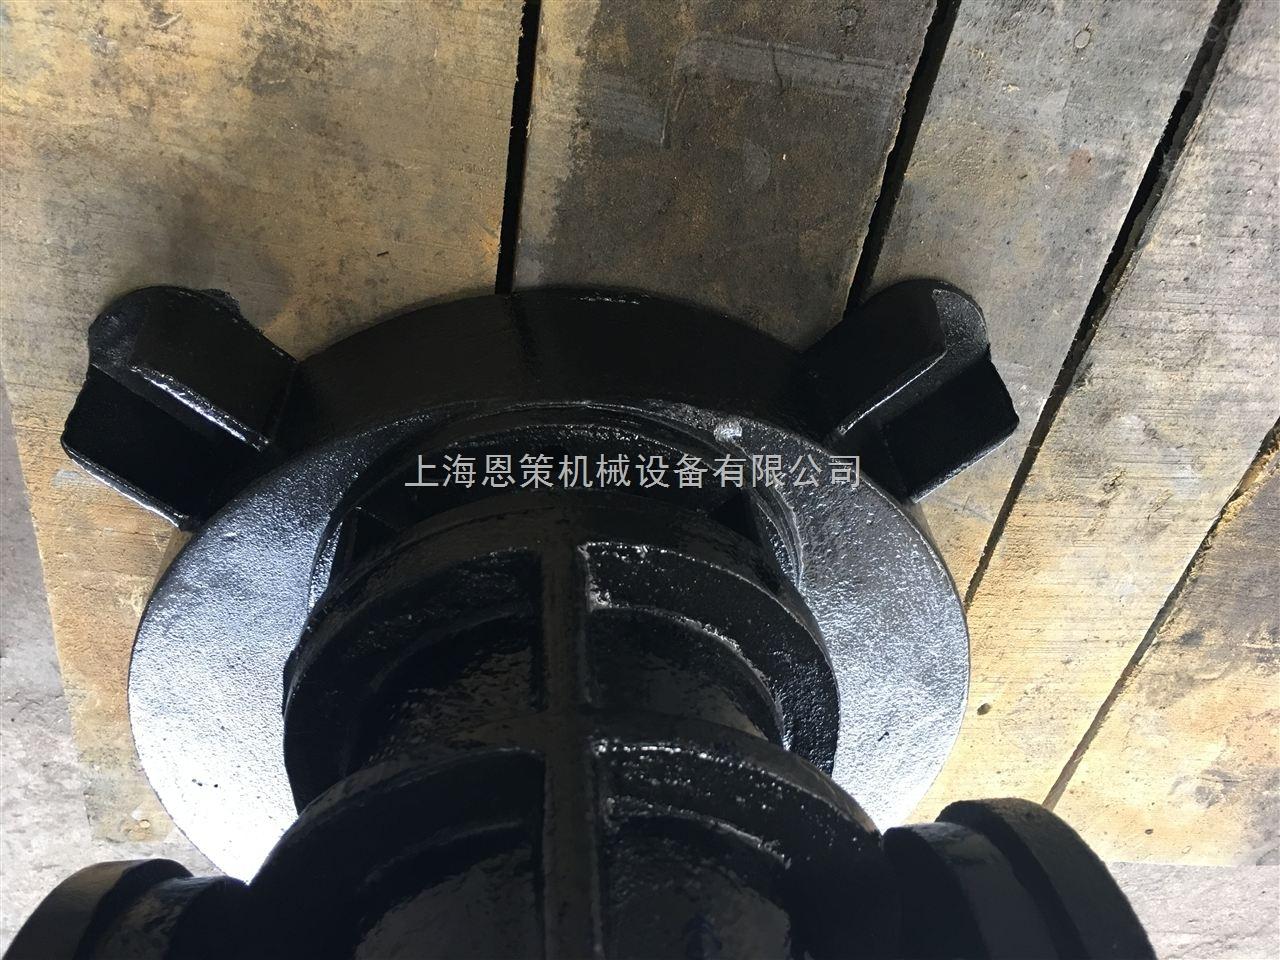 NCW系列沉水罗茨鼓风机----自主品牌、台湾技术